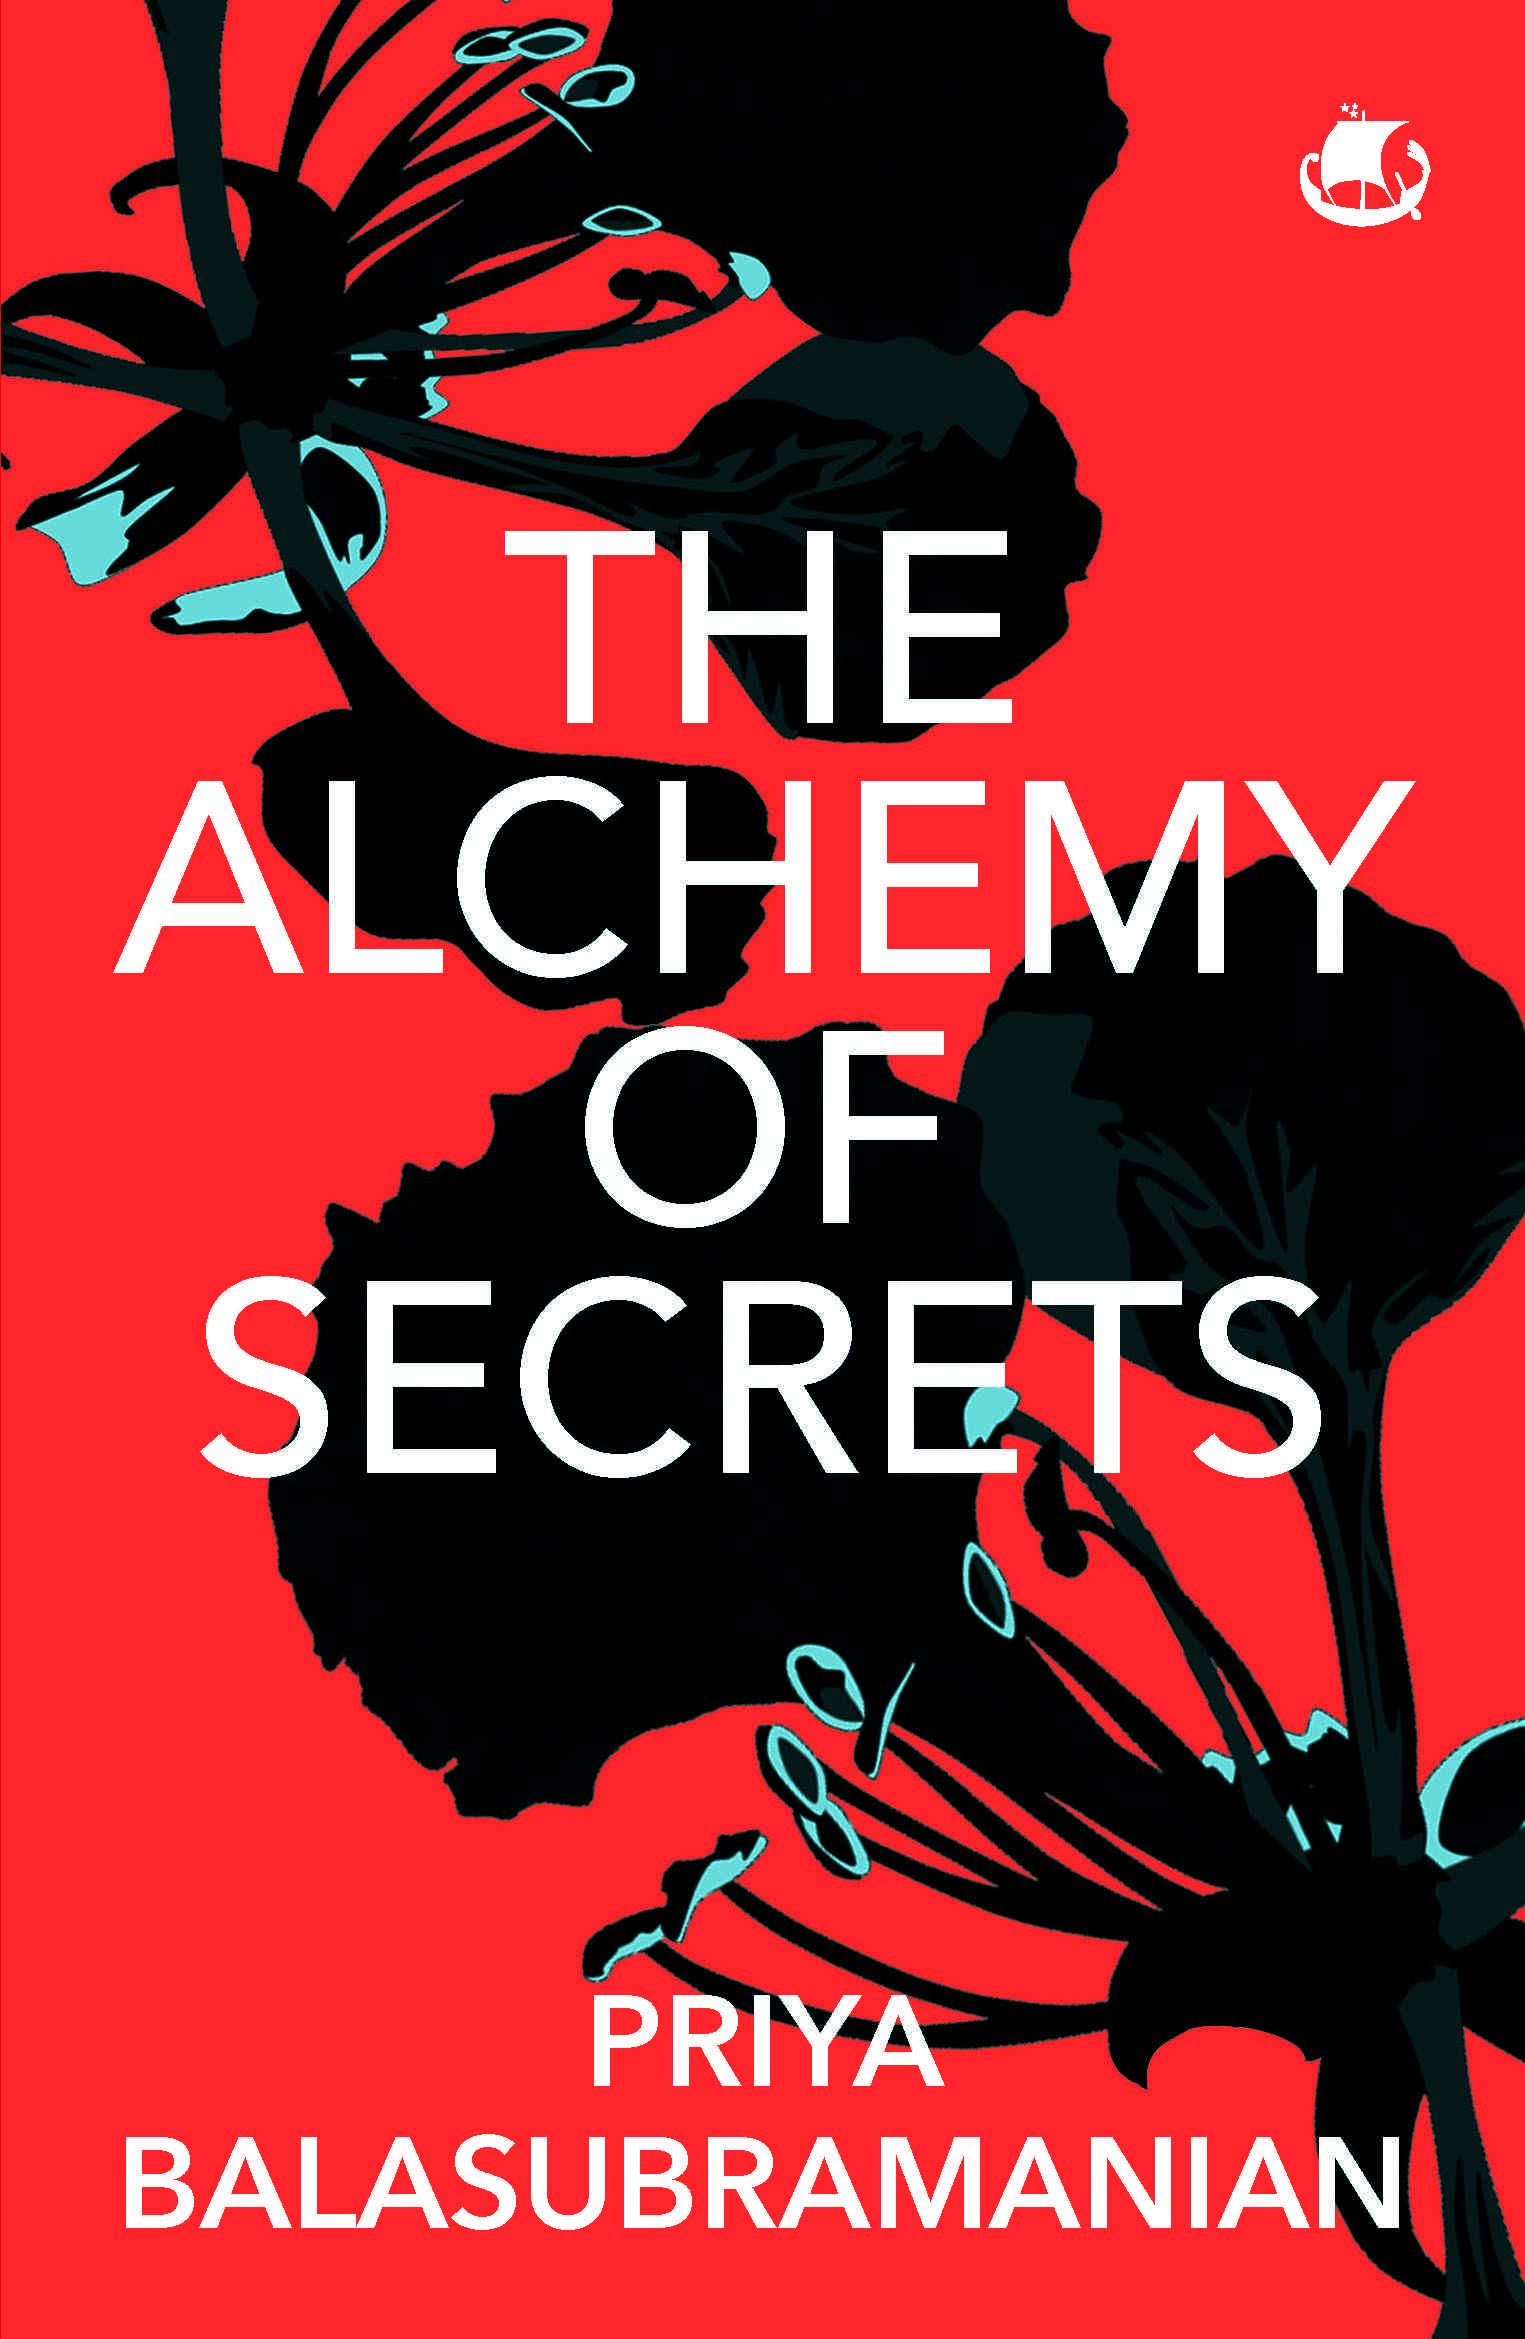 The Alchemy Of Secrets